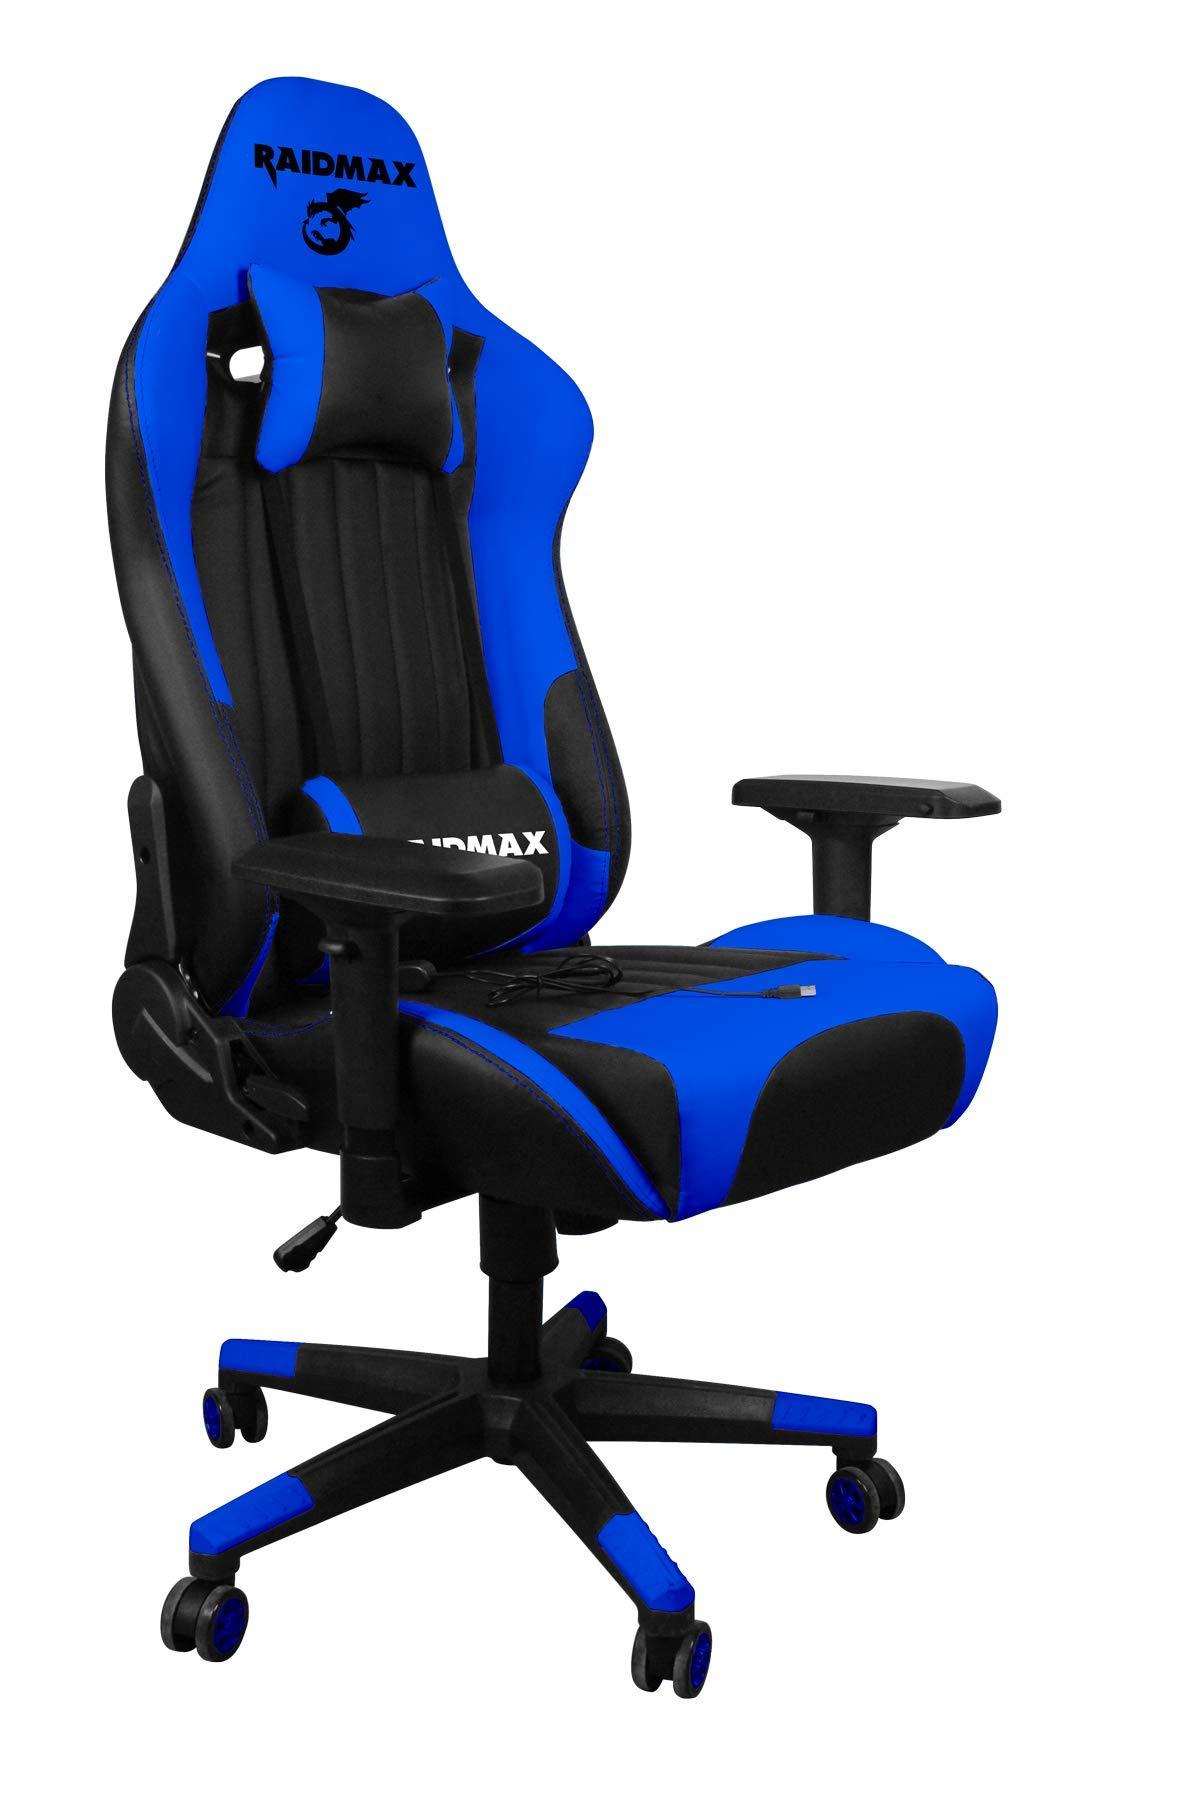 Drakon Gaming Chair Ergonomic Racing Style Pu Leather Bucket Seat, Headrest and Massage Lumber Support, 4D Adjustable Armrest (Blue/Black) by Drakon